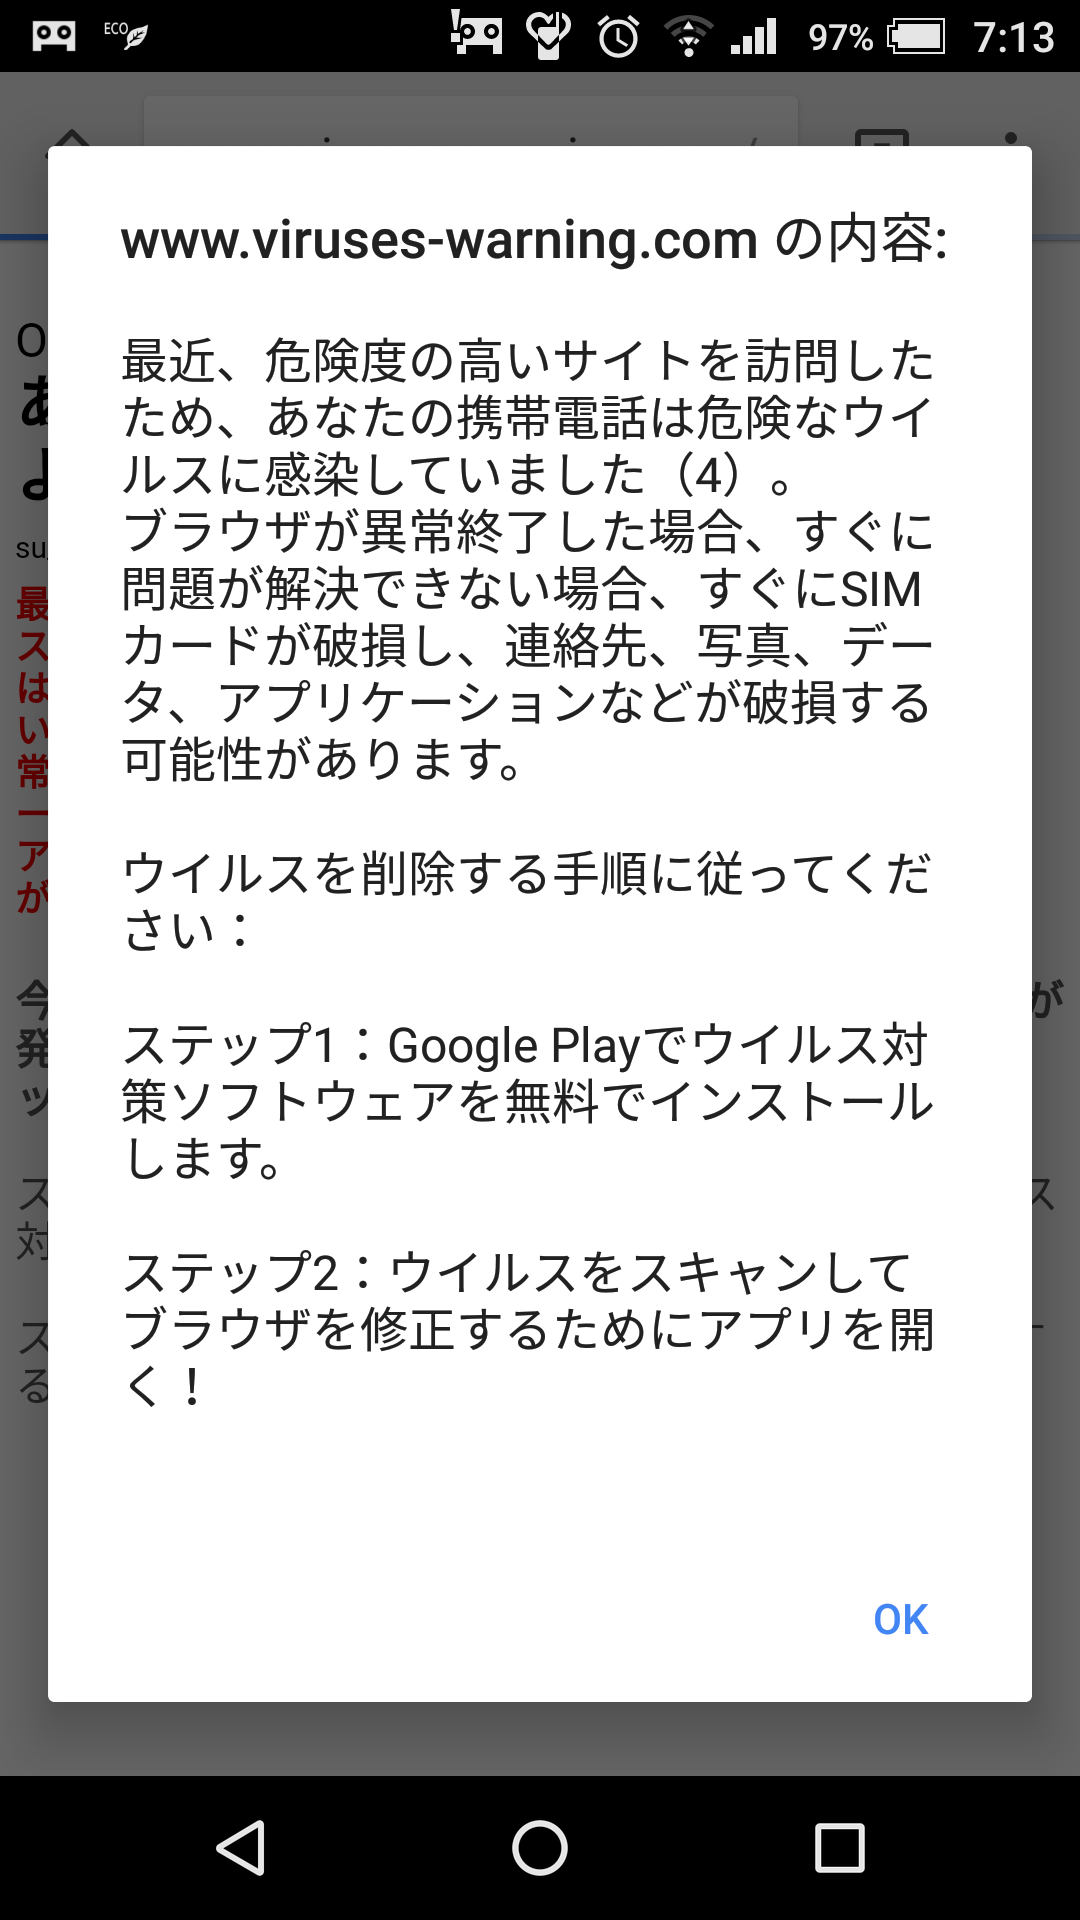 Screenshot_20171026-071358.png